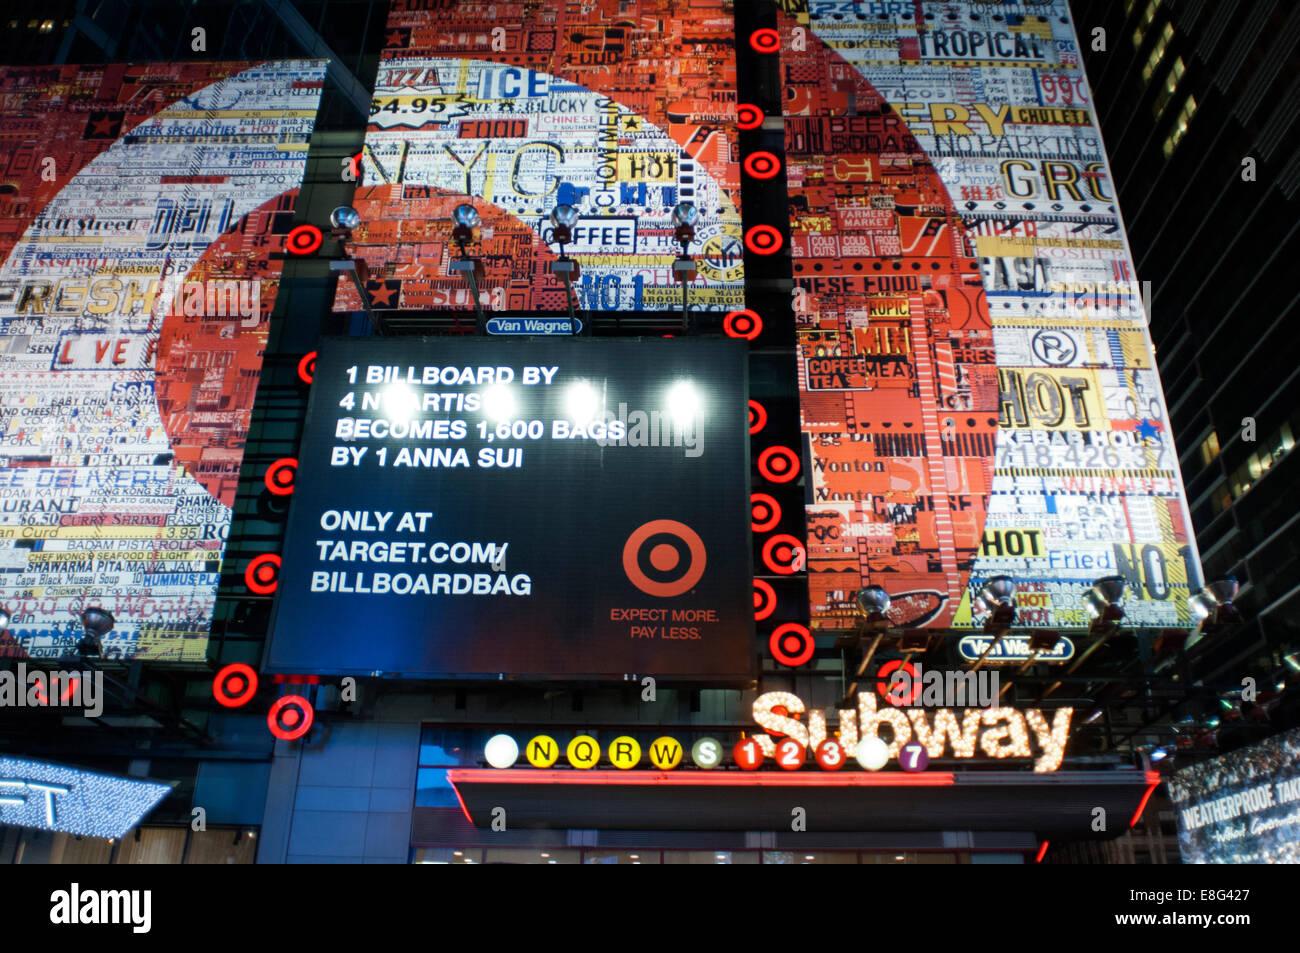 Times Square del Metro. 1560 Broadway, entre 46th y 47th Street . Teléfono 212-869-5667 (8:00 a 20:00) . Casi Imagen De Stock